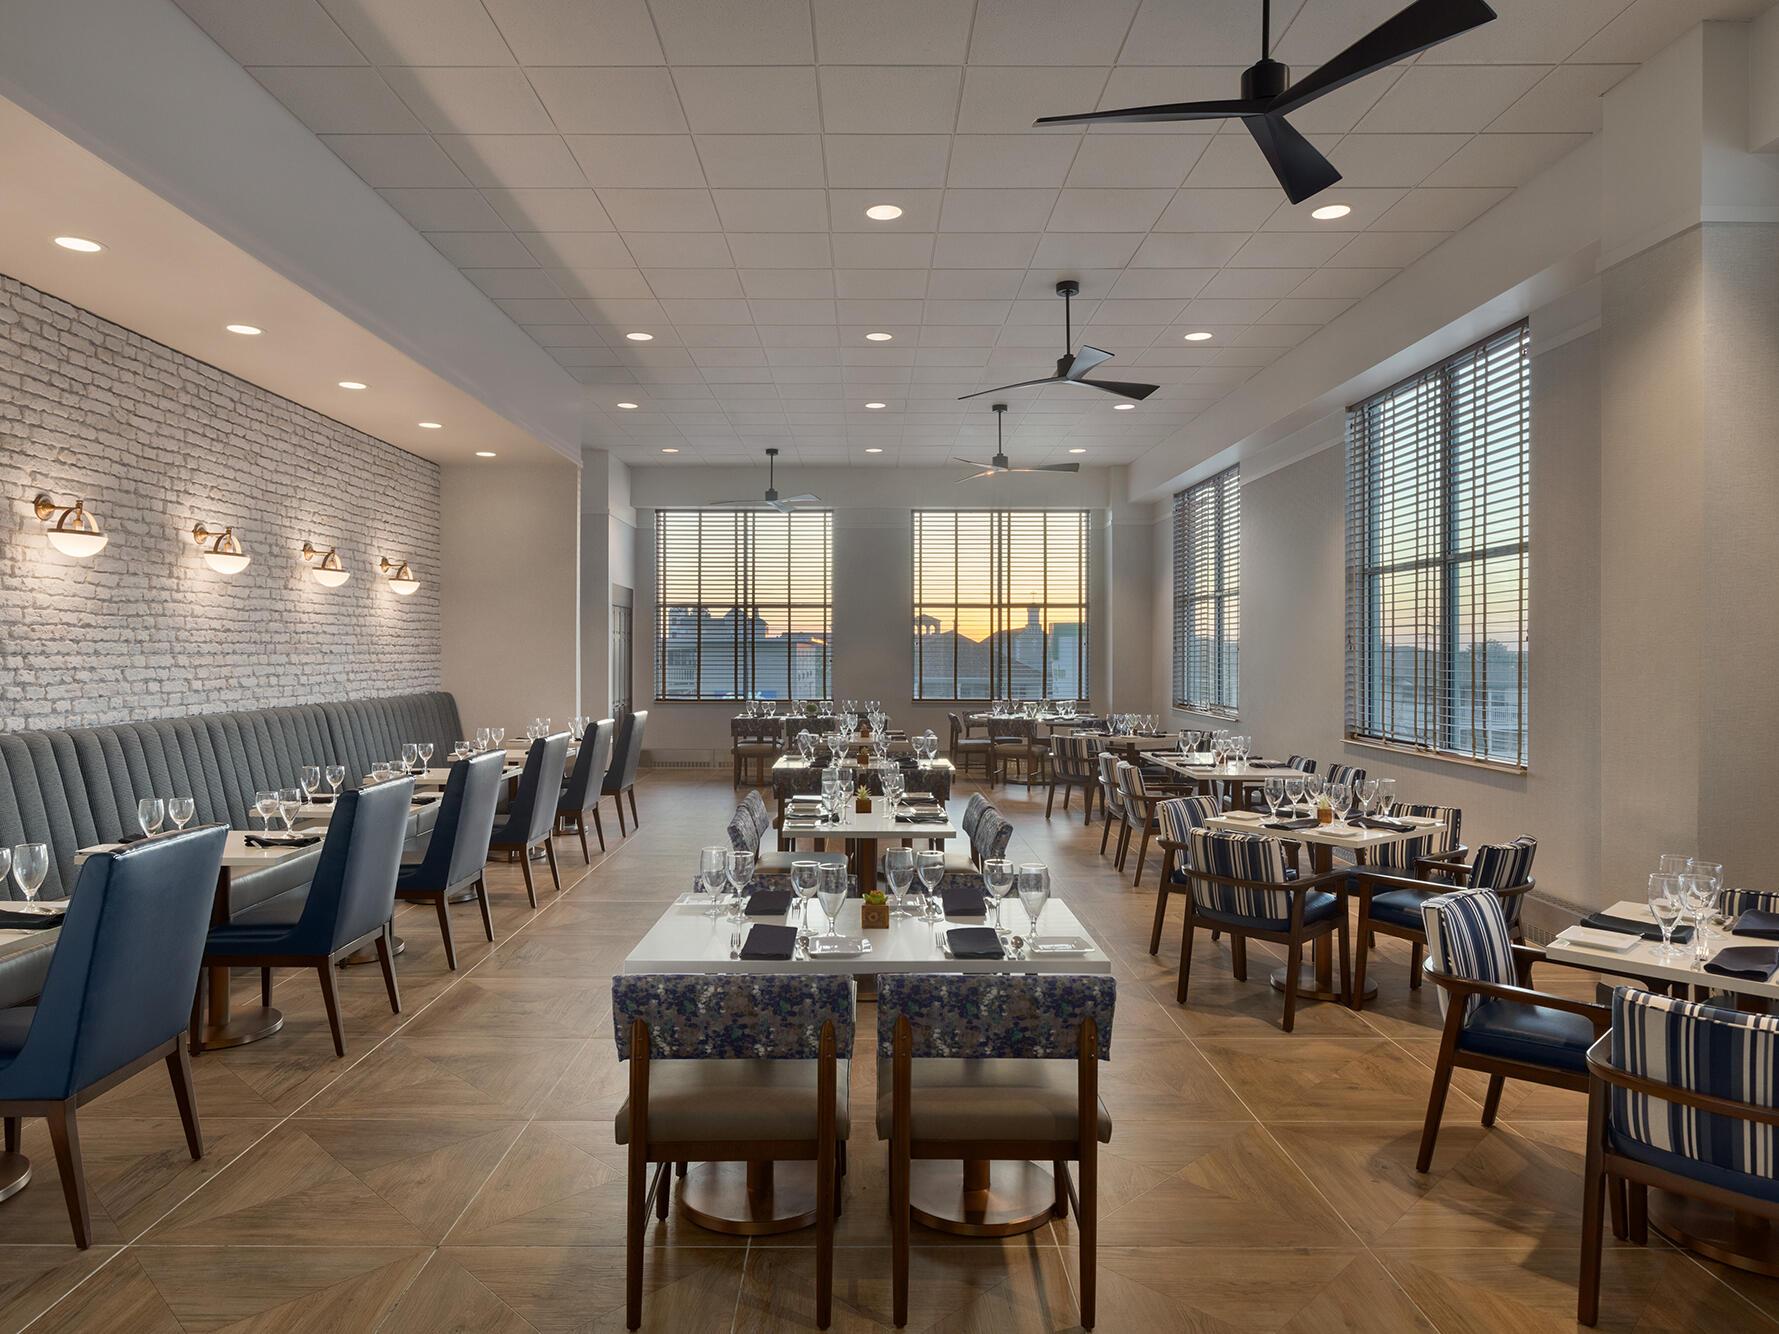 coral reef dining room